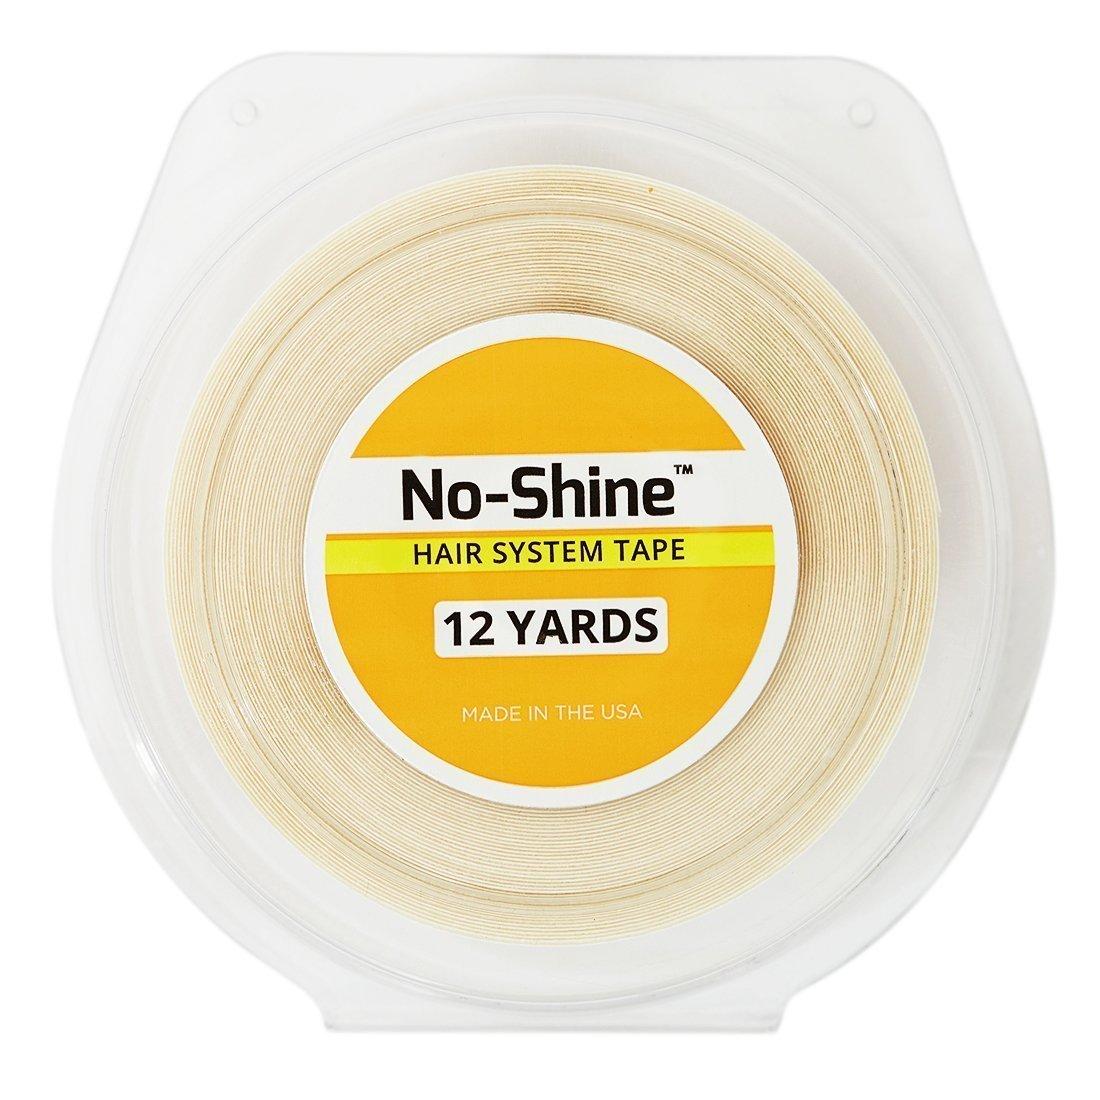 No Shine Bonding Double Sided Tape Walker 3/4 x 12 Yards Roll by Walker Tape CECOMINOD023678